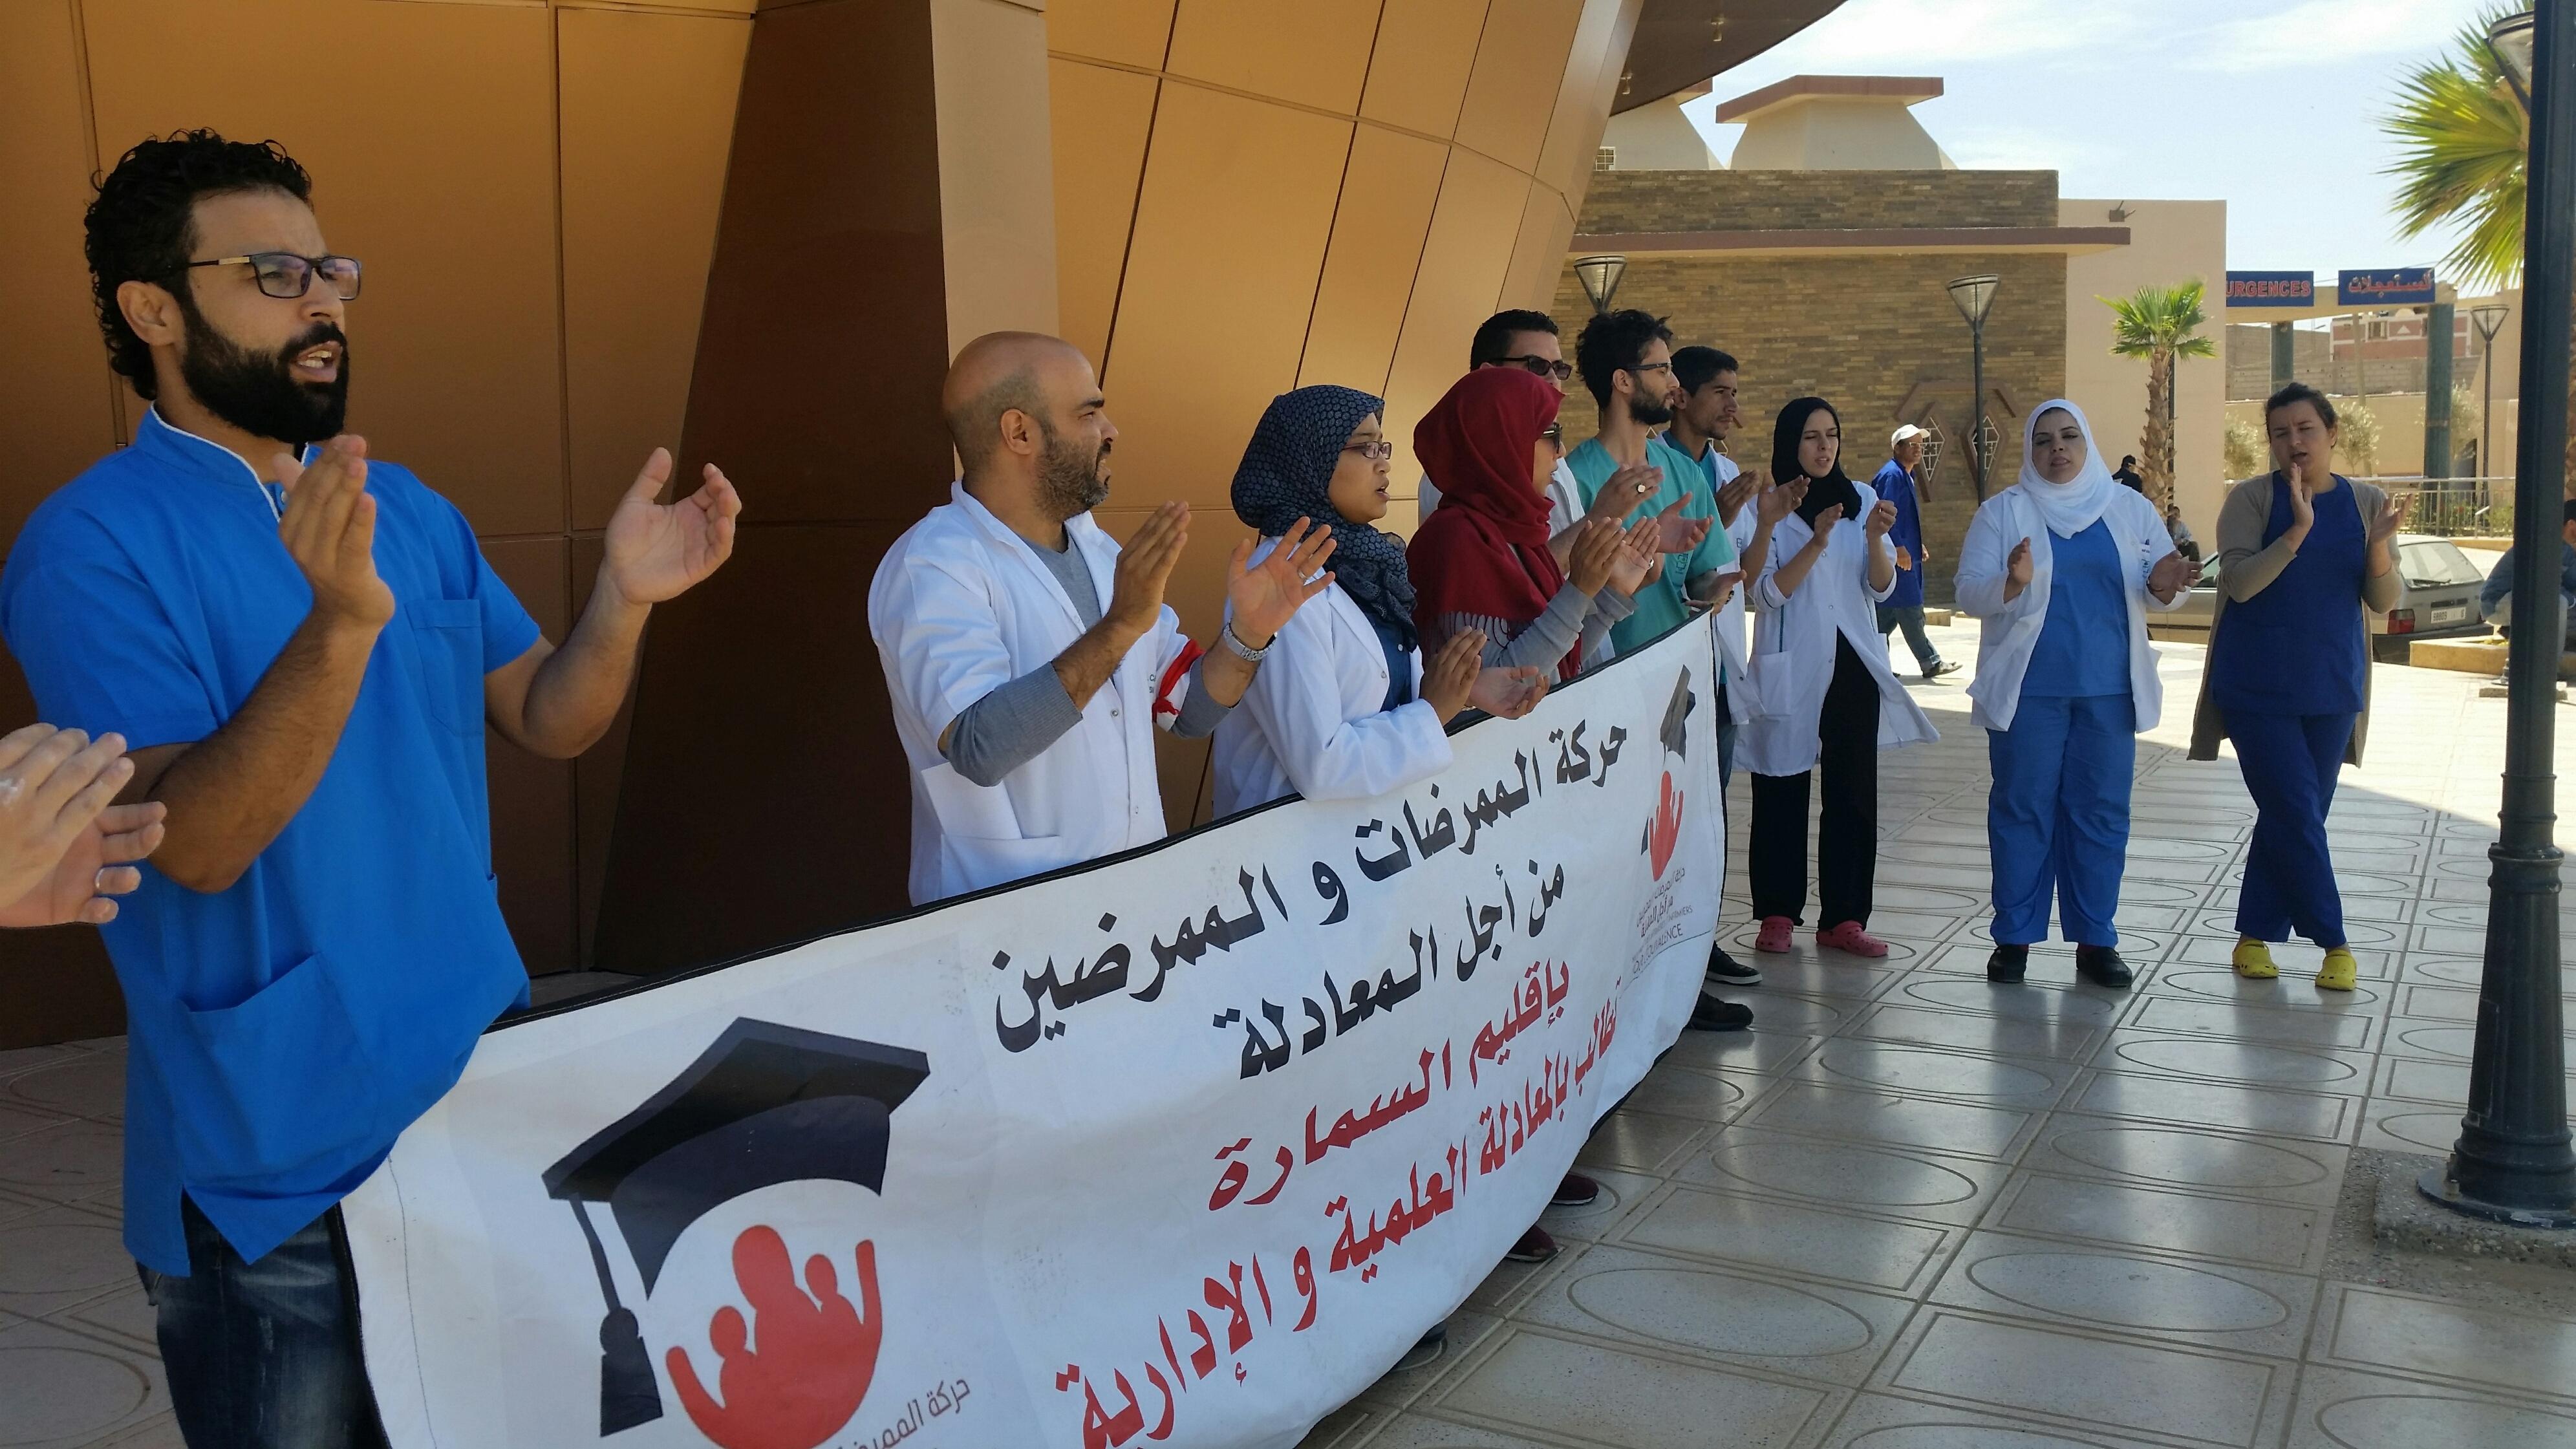 Photo of حركة الممرضات والممرضين من أجل المعادلة في وقفة احتجاجية